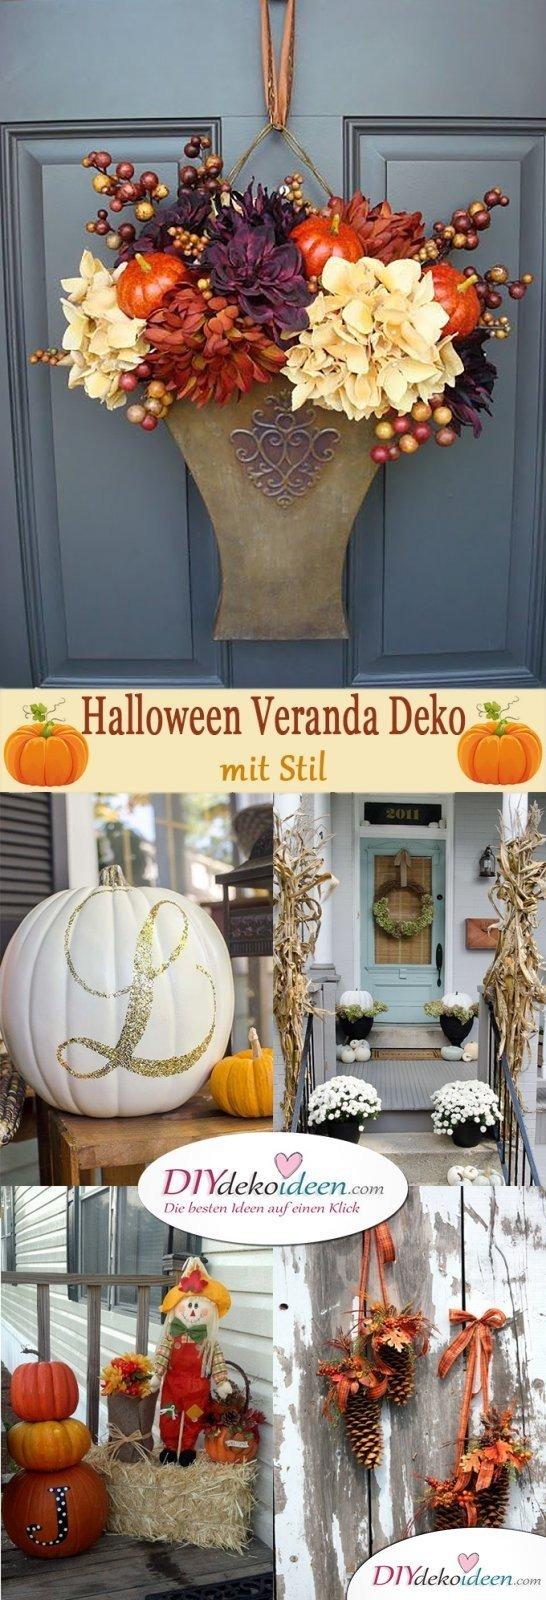 DIY Dekoideen - Halloween Veranda Deko mit Stil